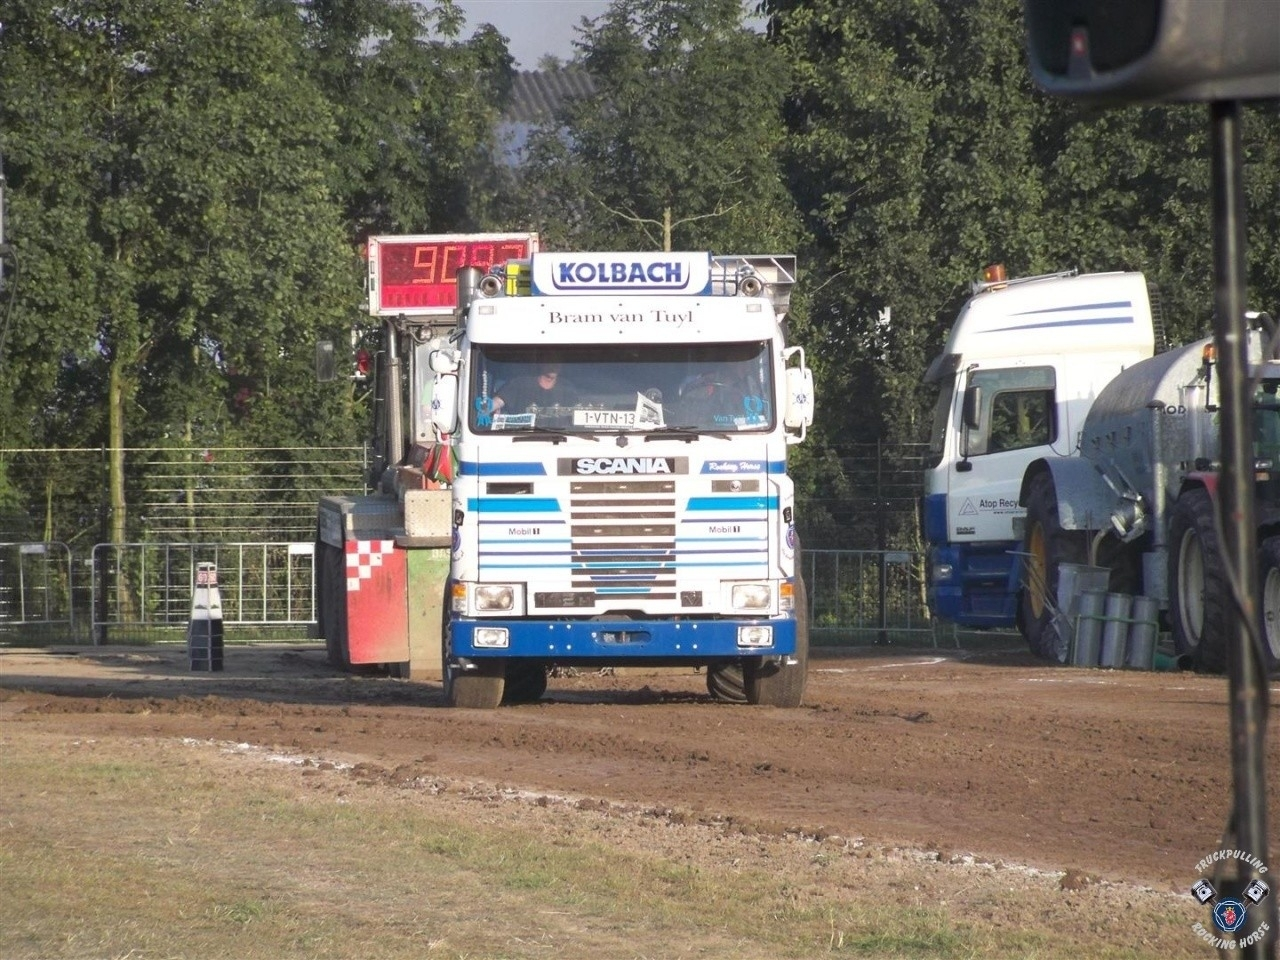 almkerk-2012-033